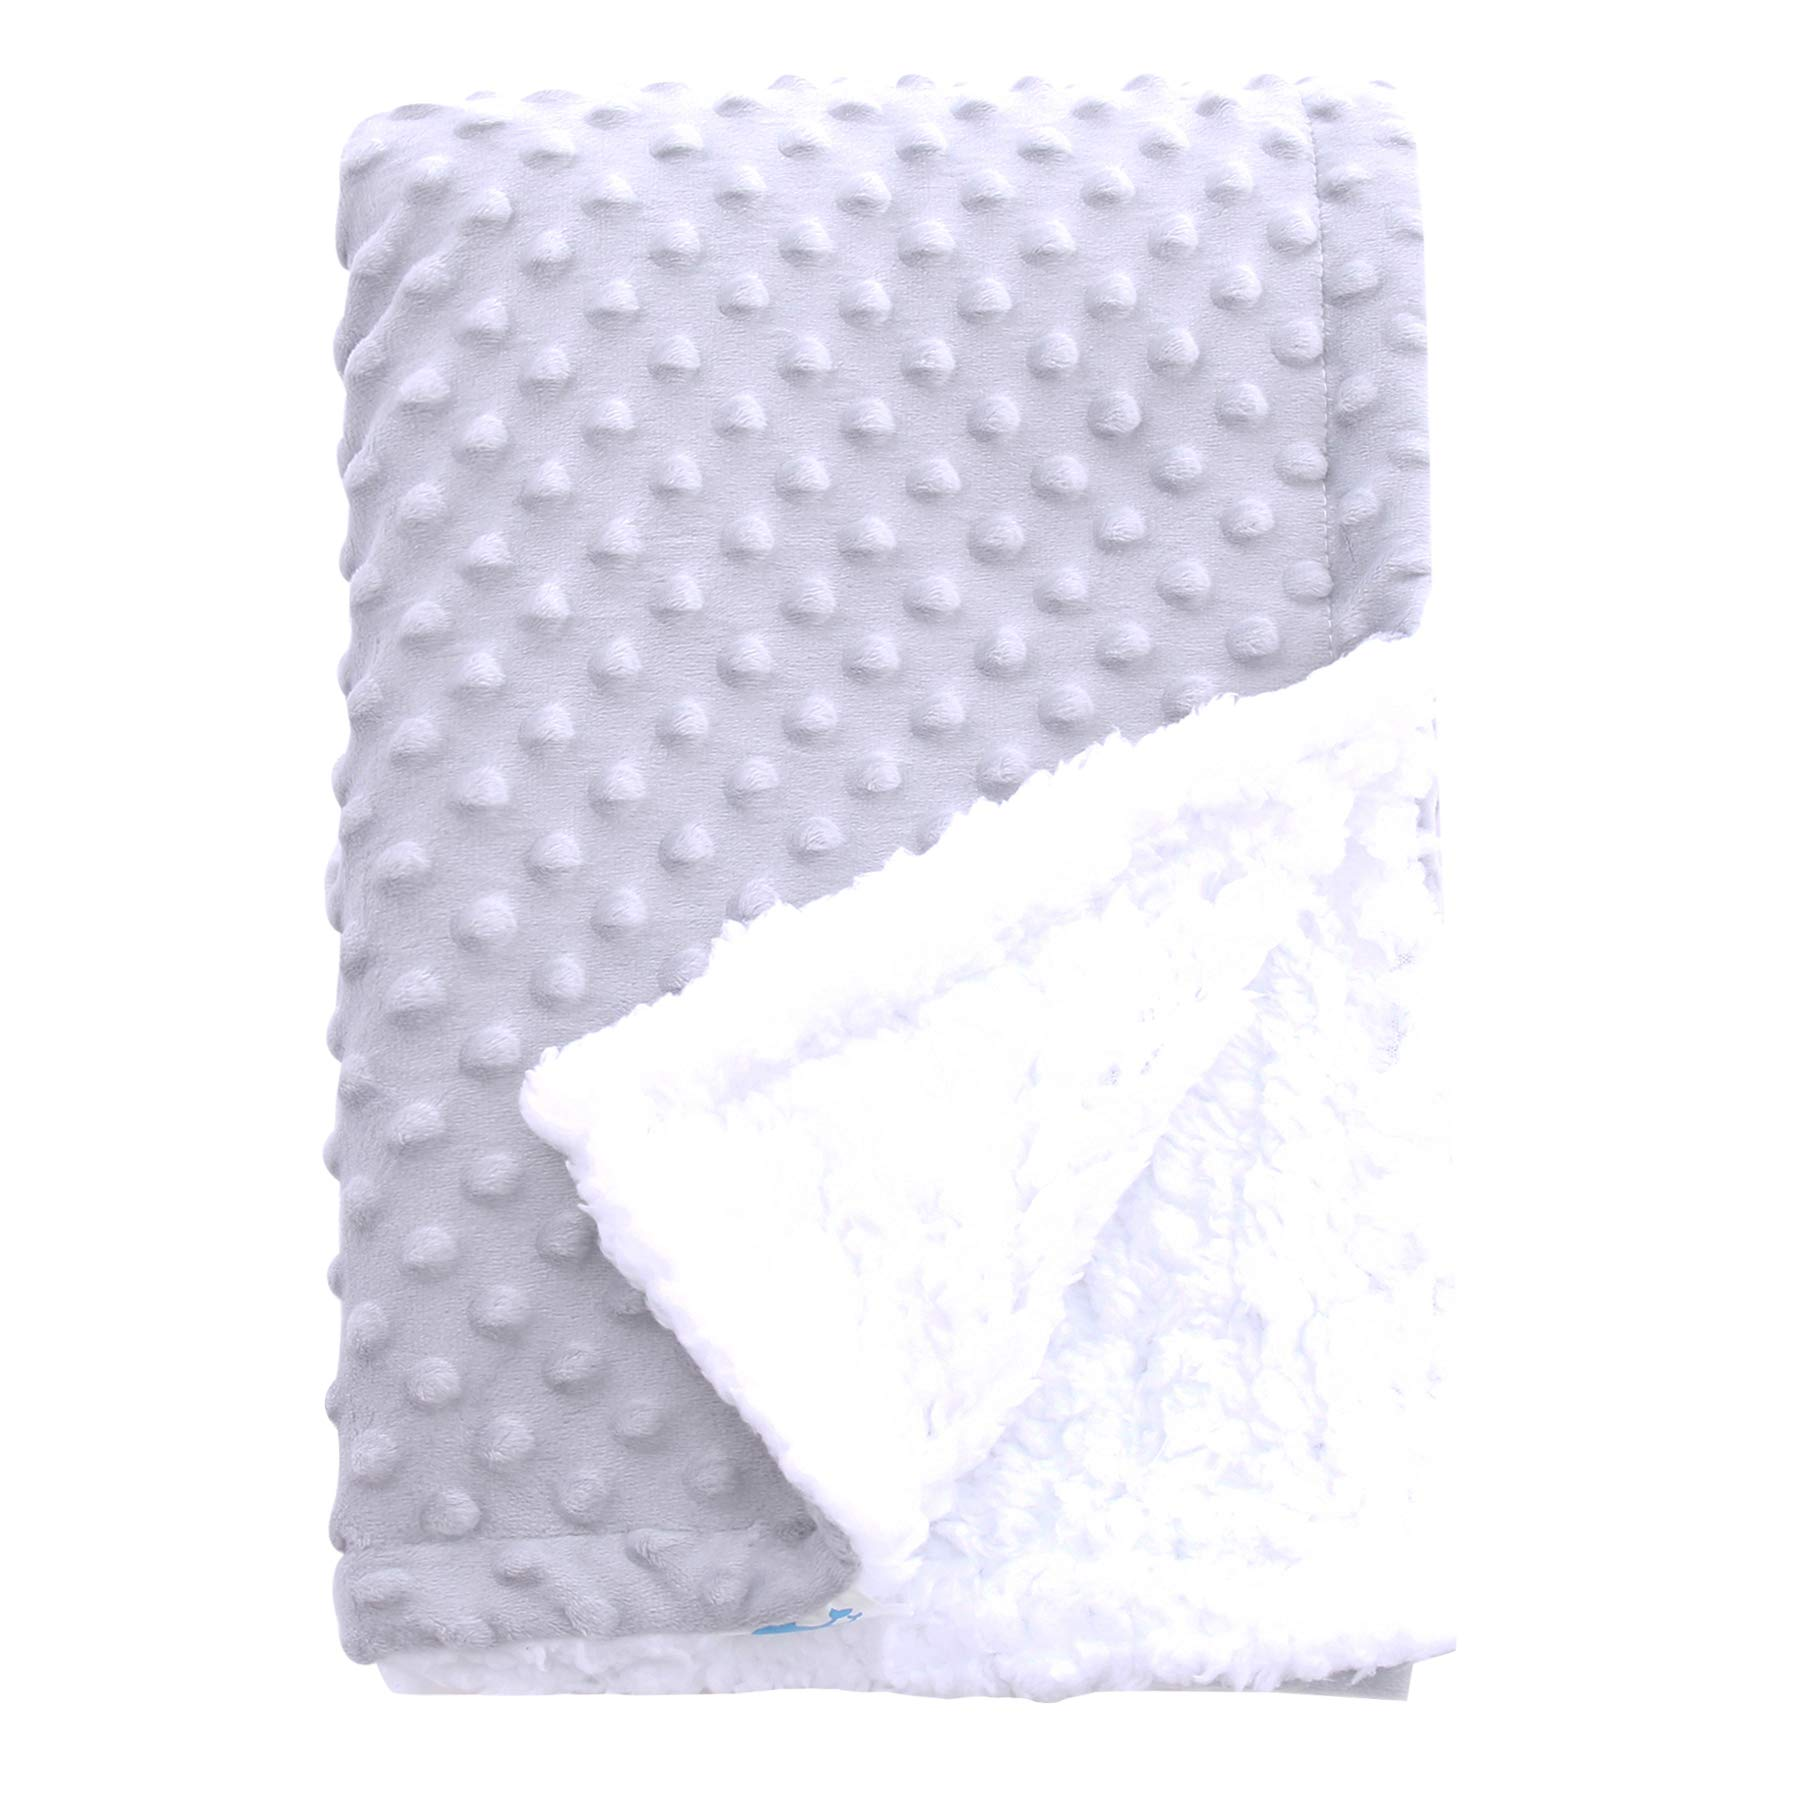 SWEET DOLPHIN Sherpa Minky Baby Blankets for Crib Stroller Nap Fuzzy Warm